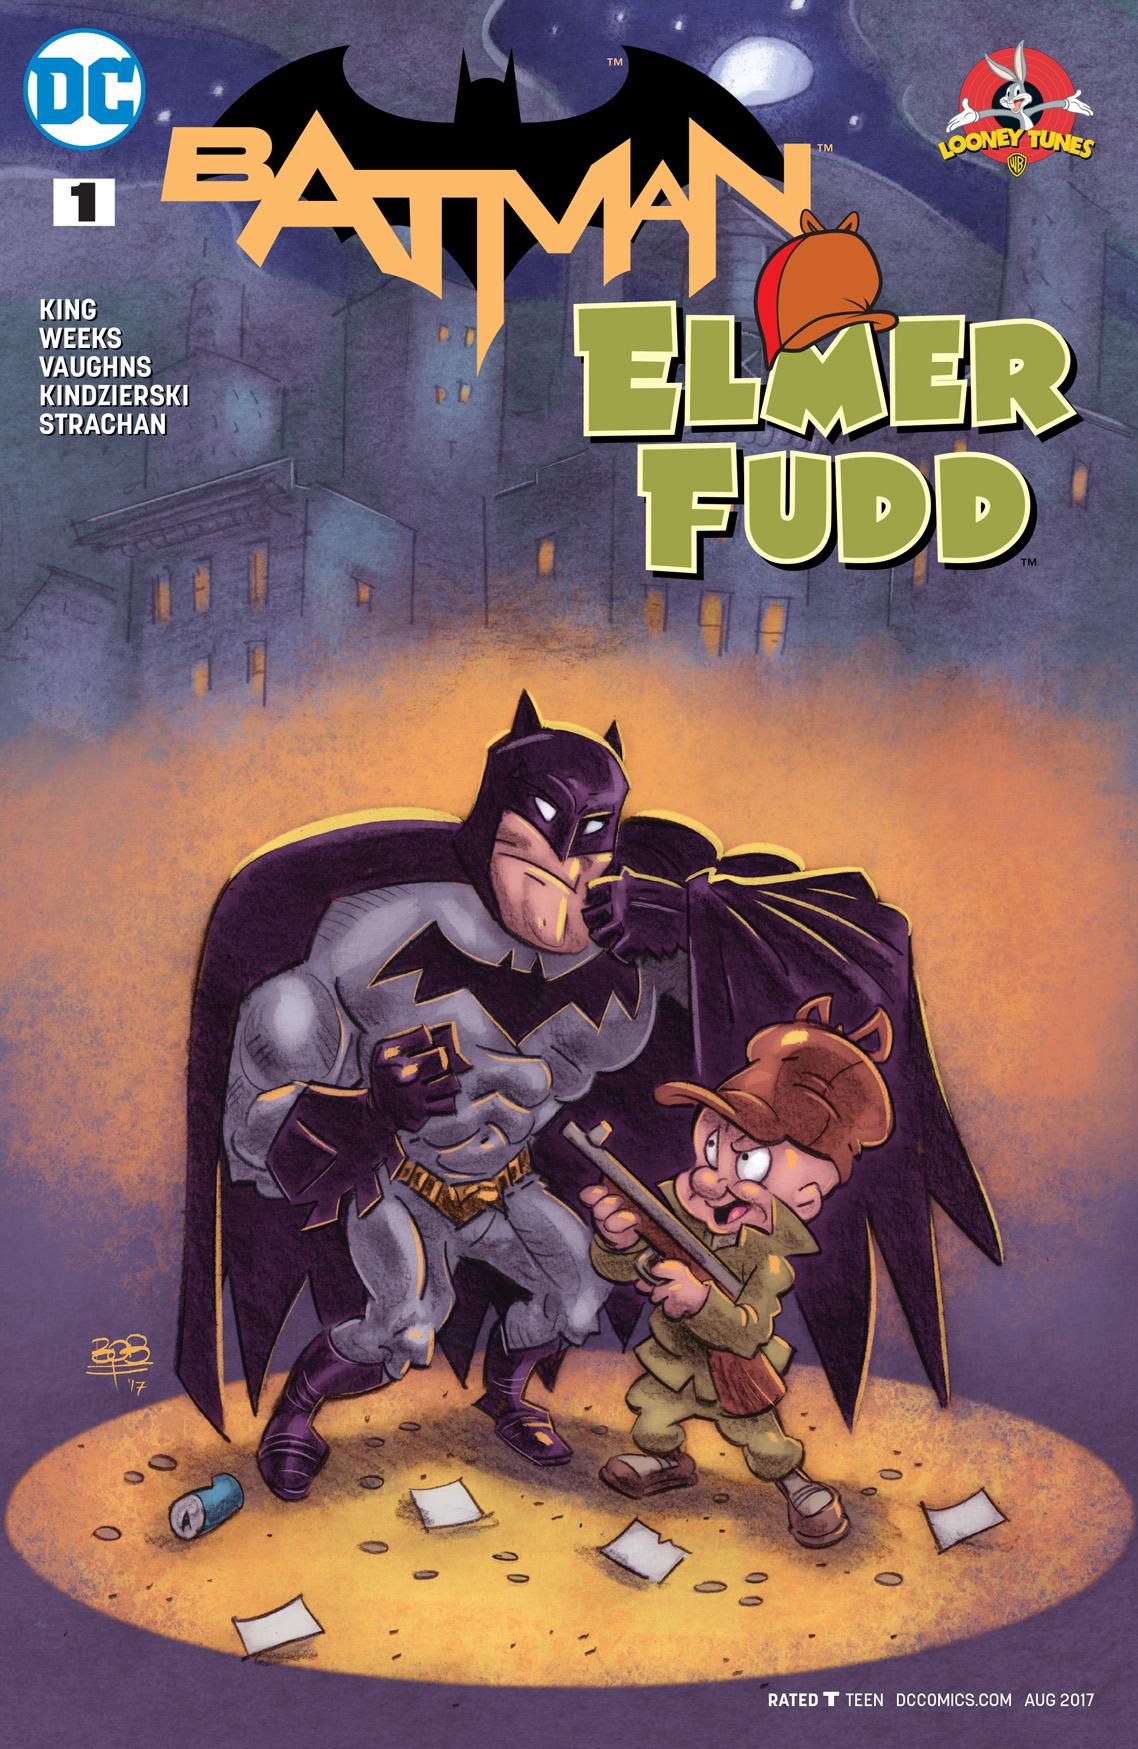 Batman Special 1 Elmer Fudd